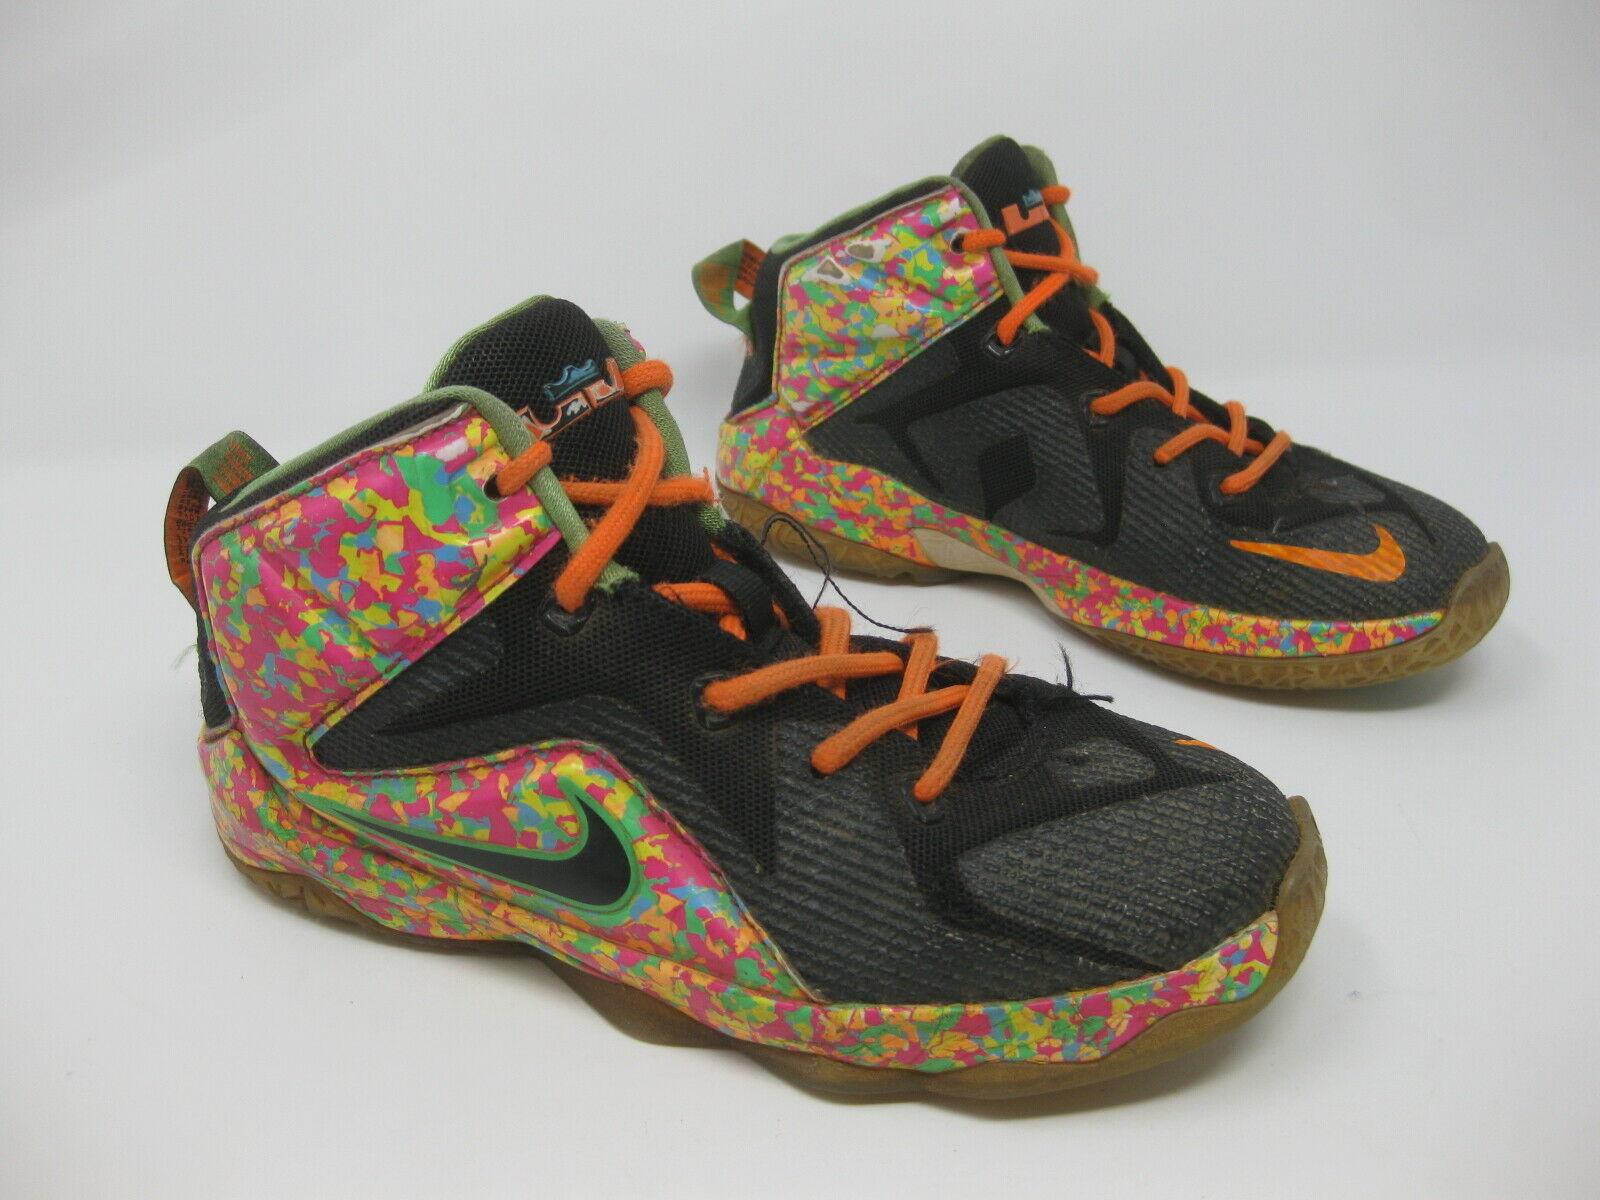 Nike LeBron XII Black Fruity Pebble Sneakers 685185-008 1Y - BEAT UP